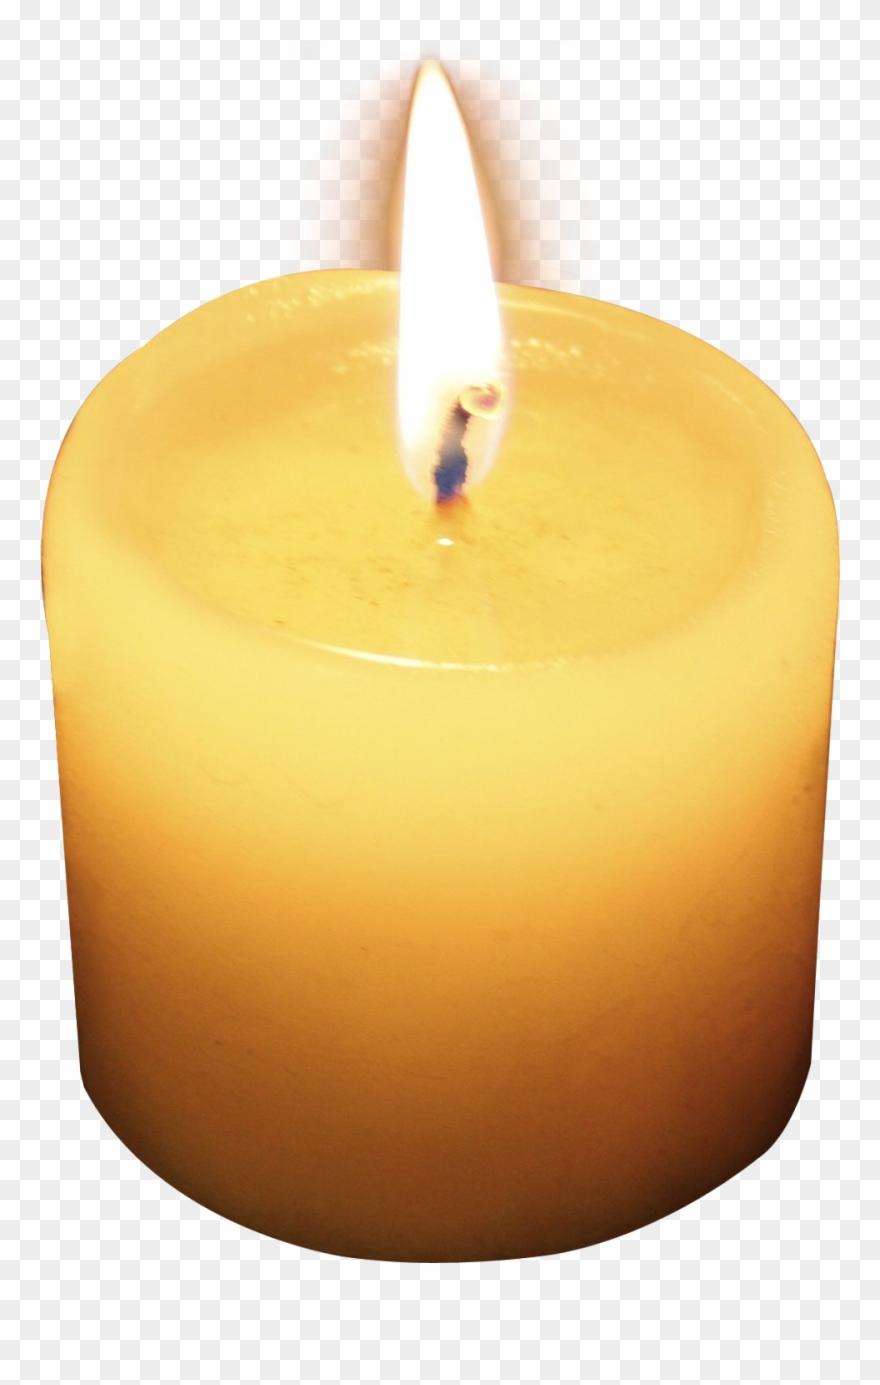 Candle Png Transparent.